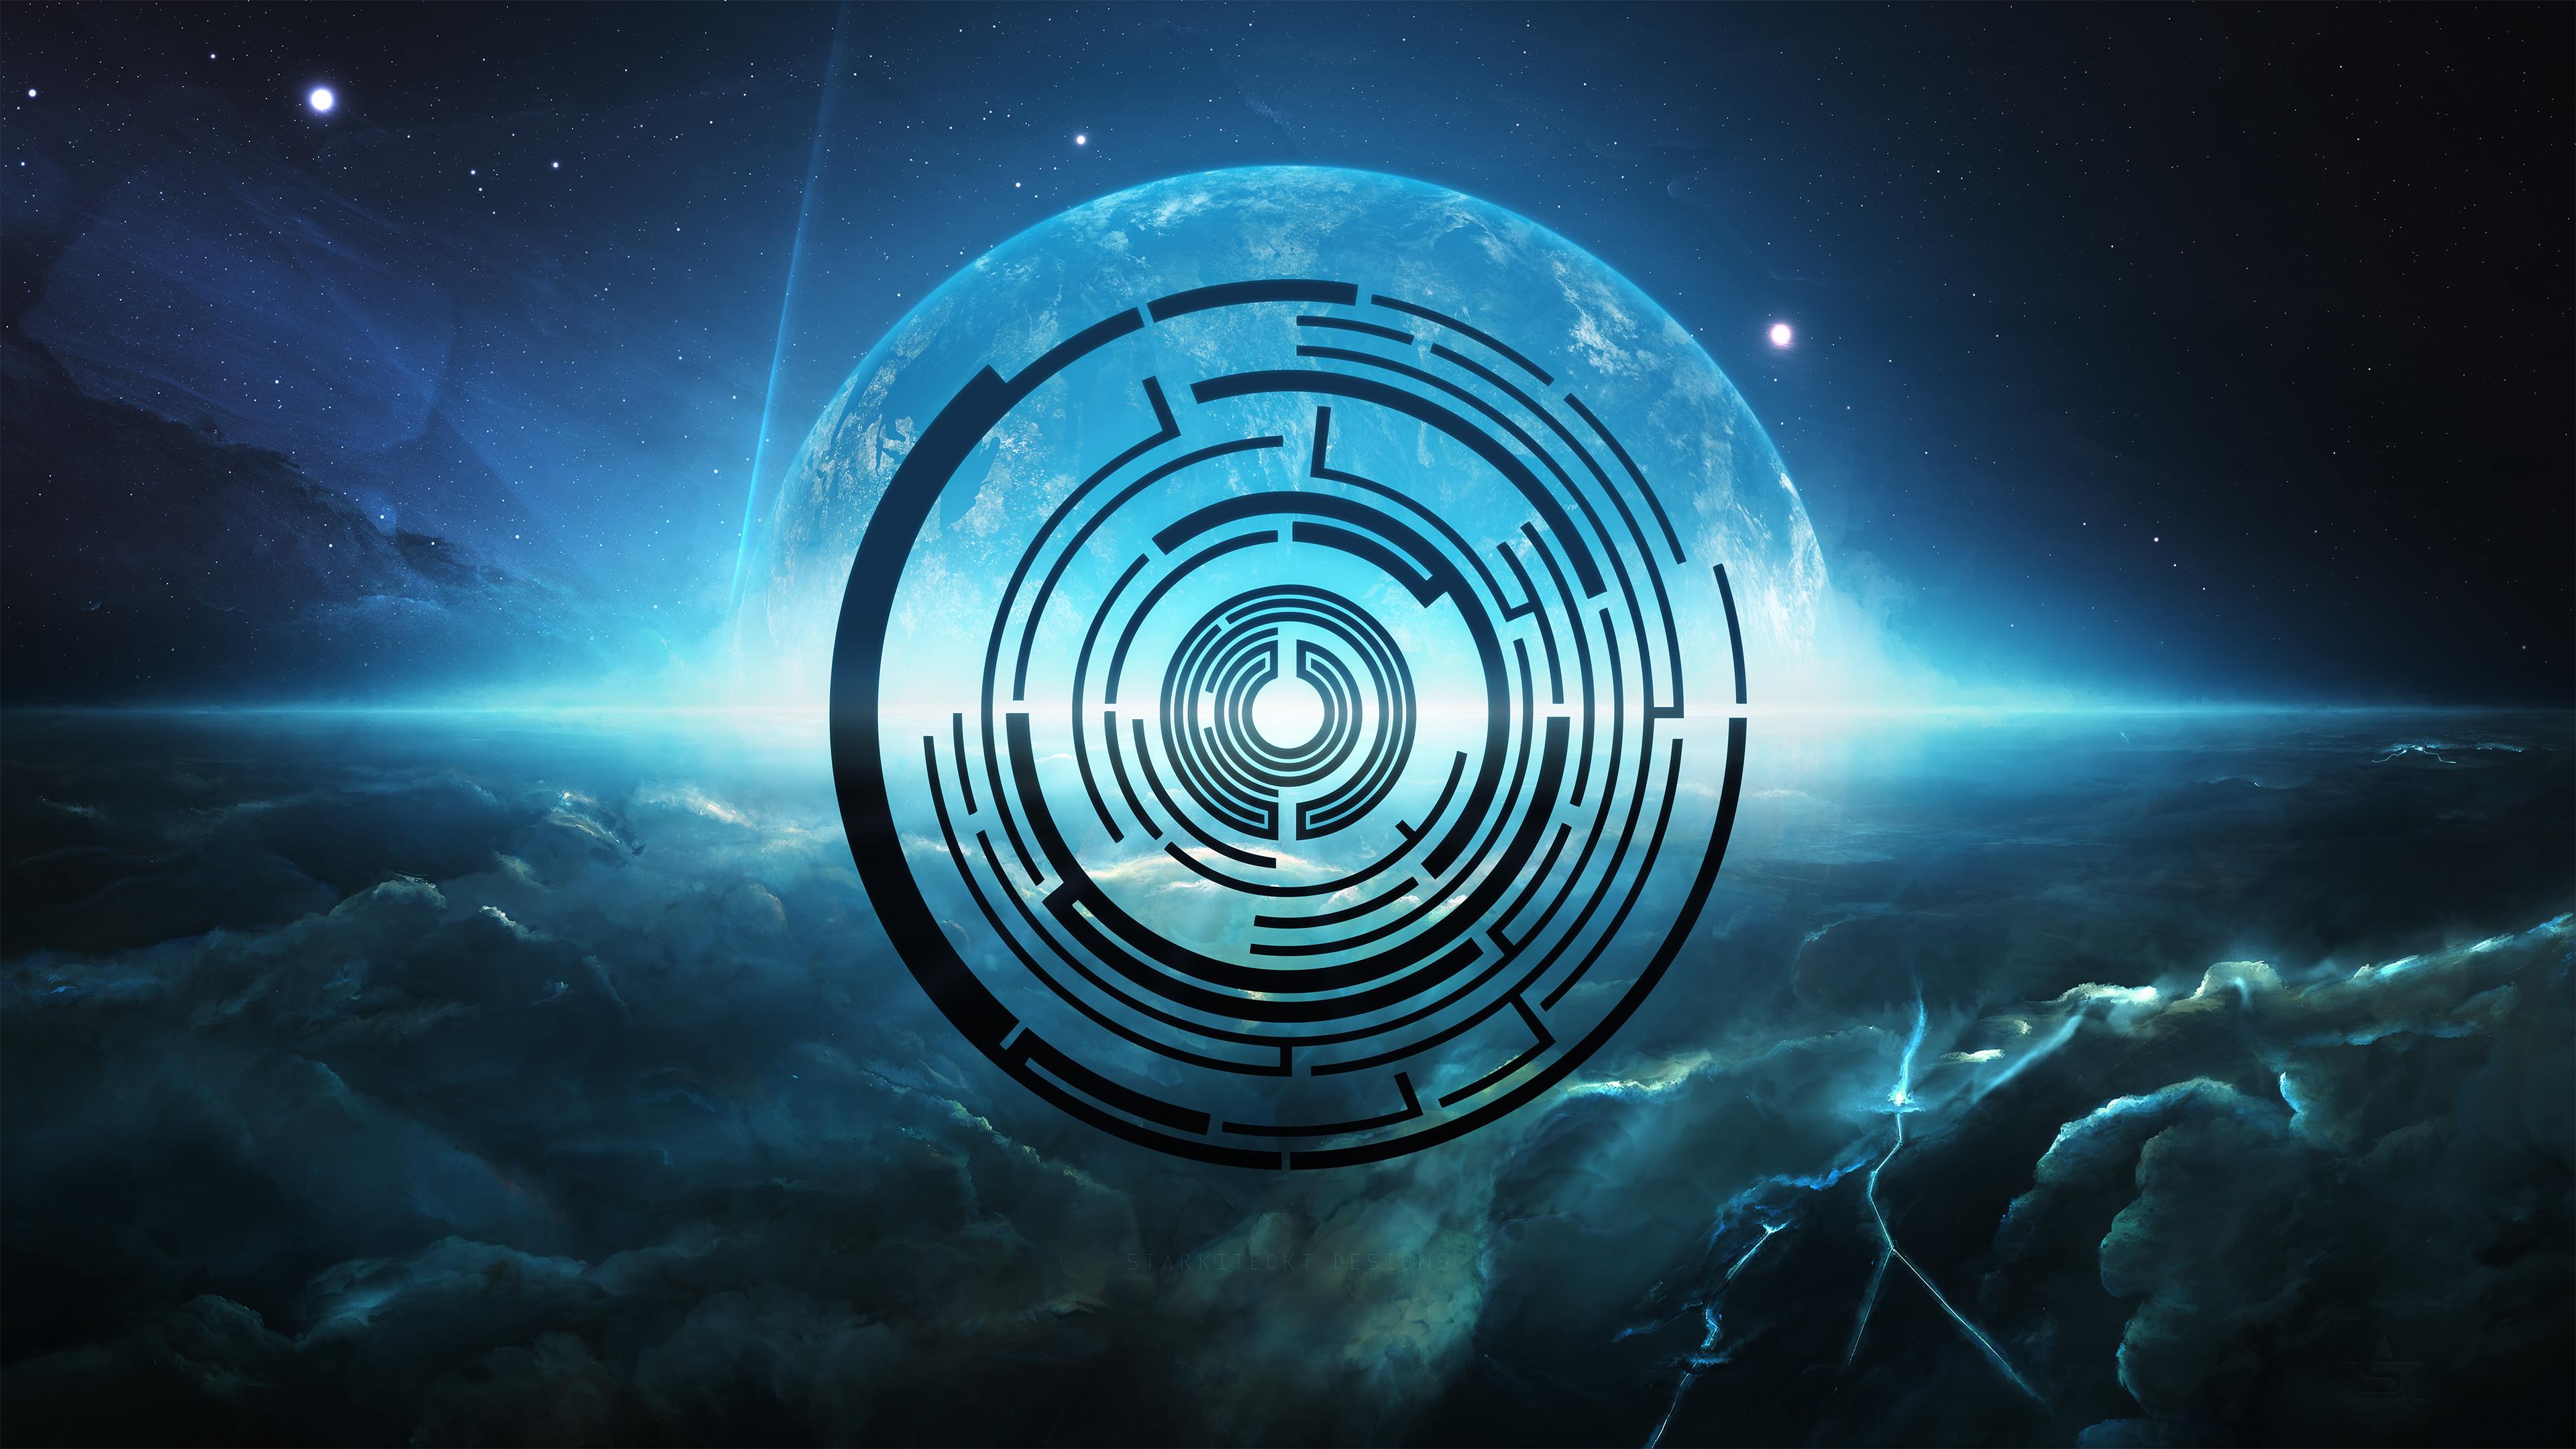 Pendulum Space Wallpaper[3840×2160]